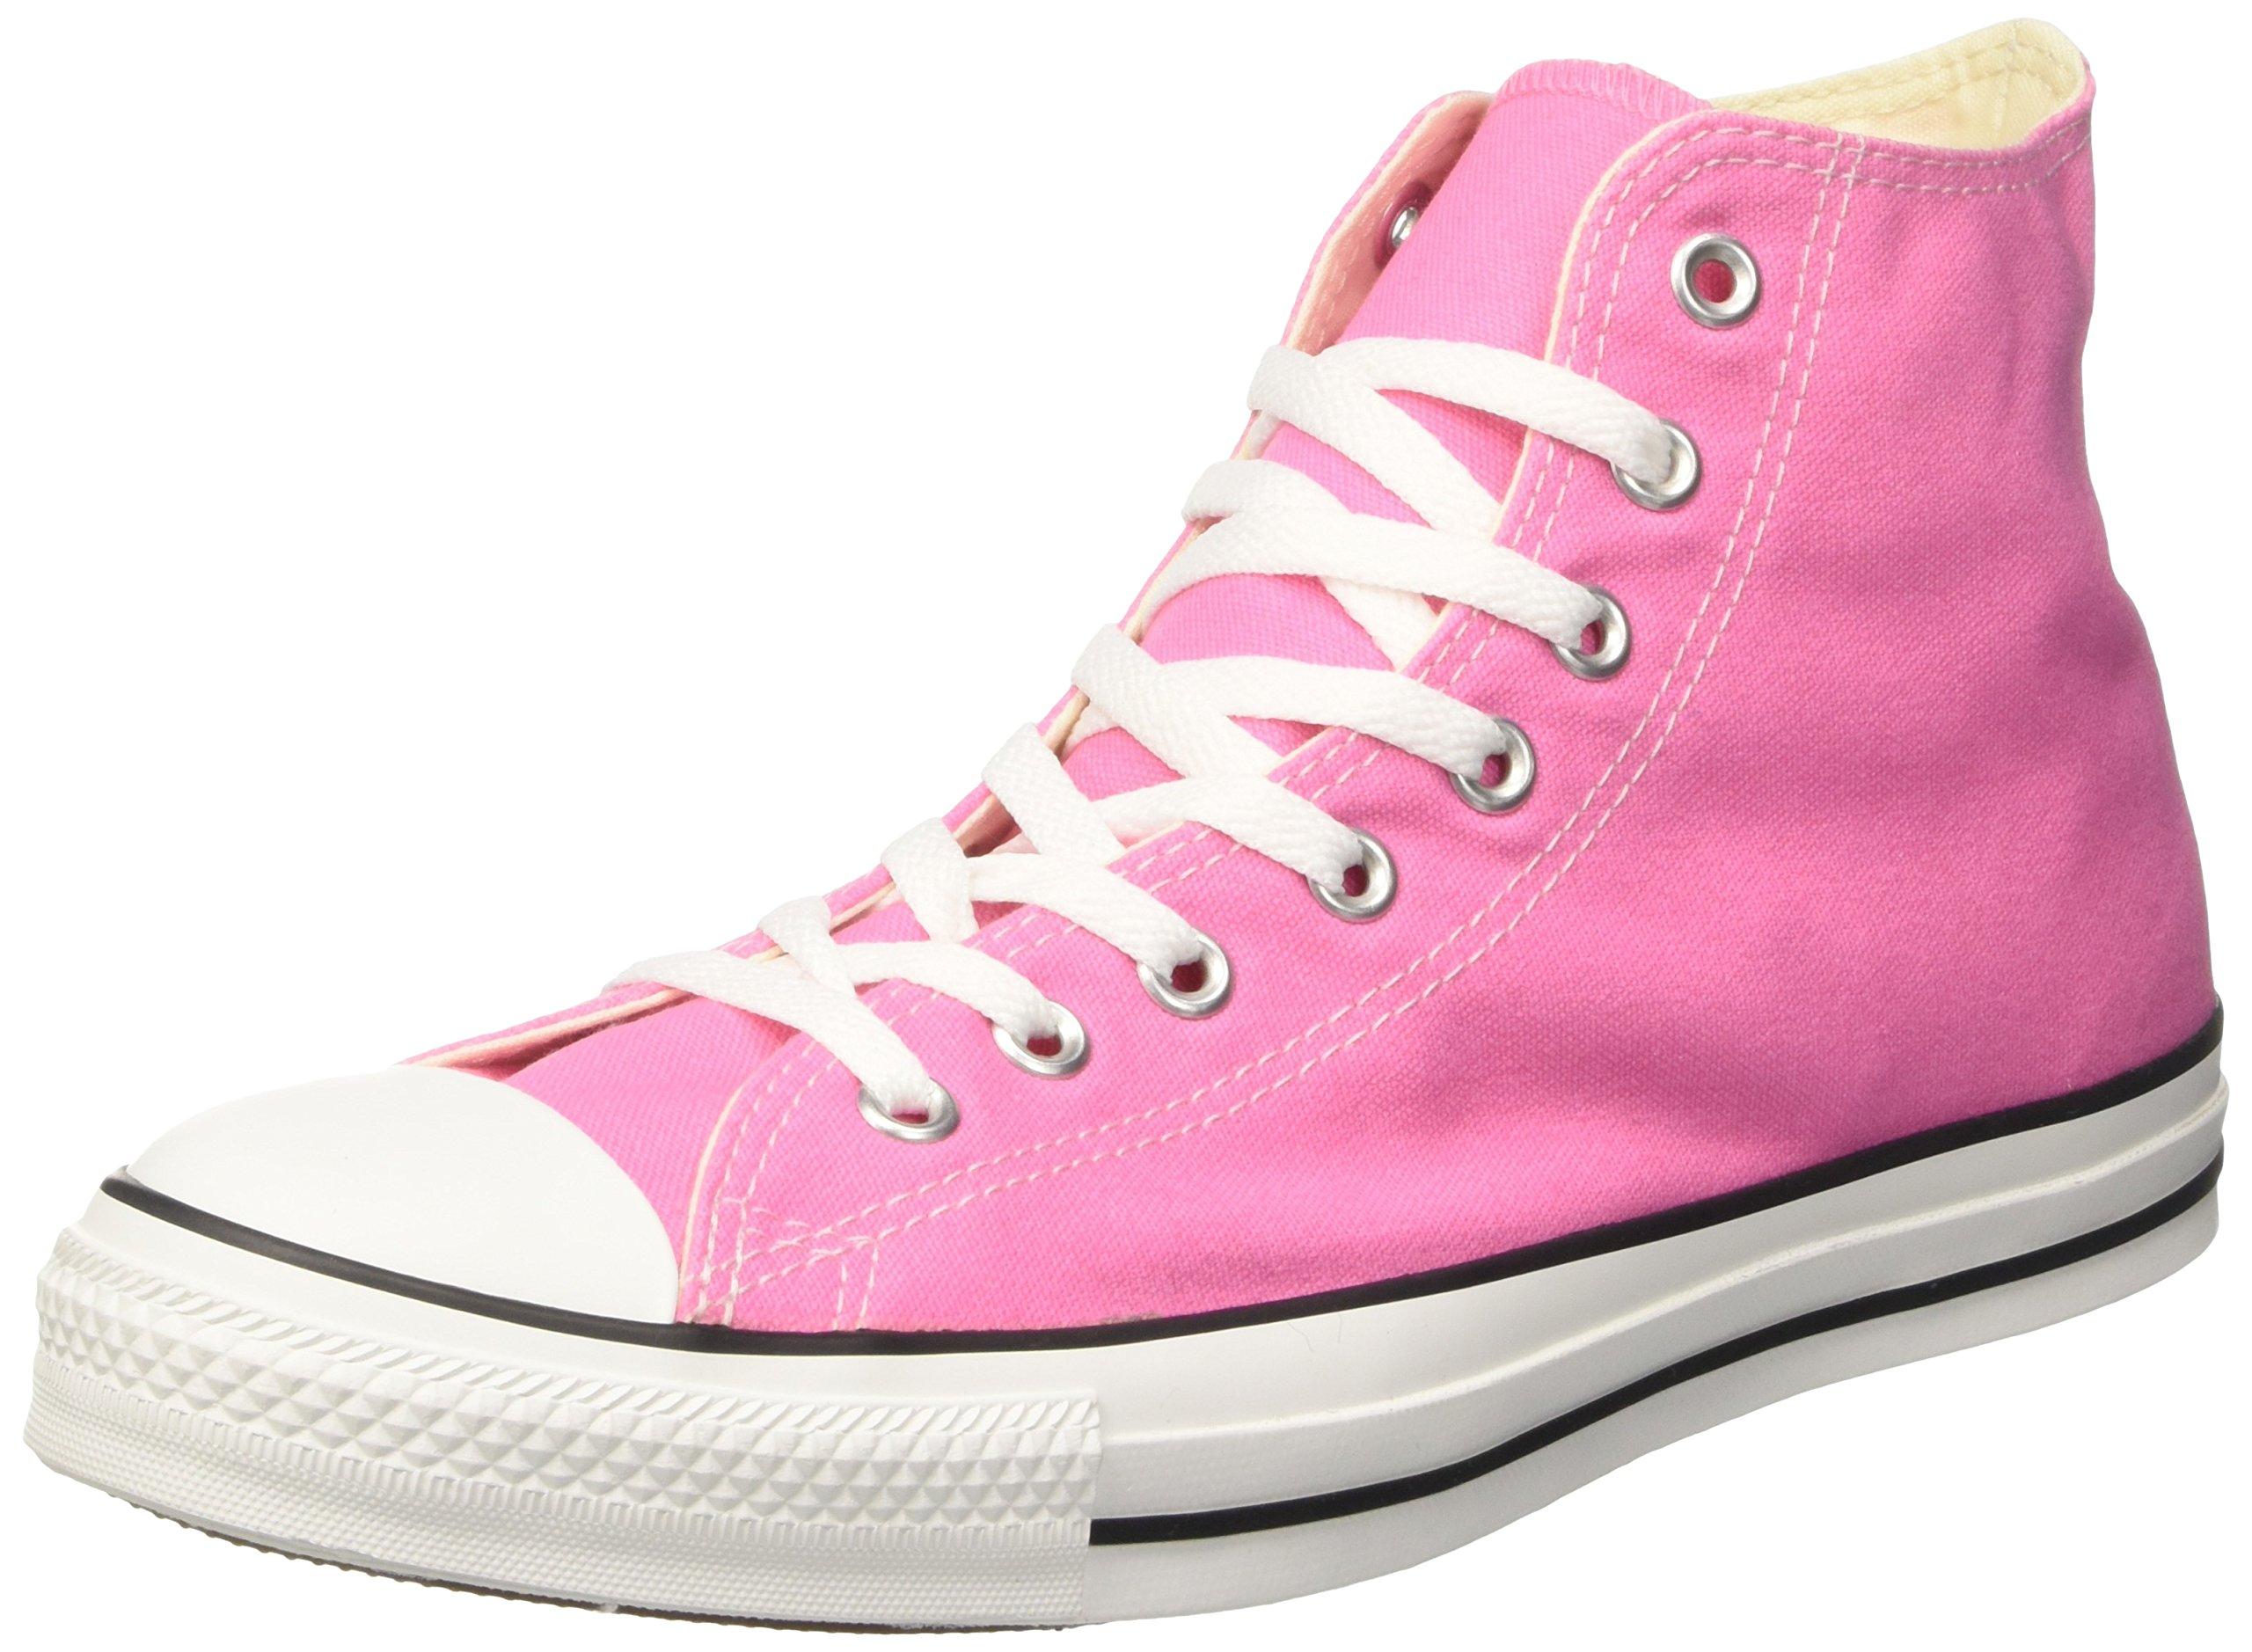 Converse Unisex Adults' M9006C Hi-Top Trainers, Pink (Pink/Pink), 11.5 UK 46 EU